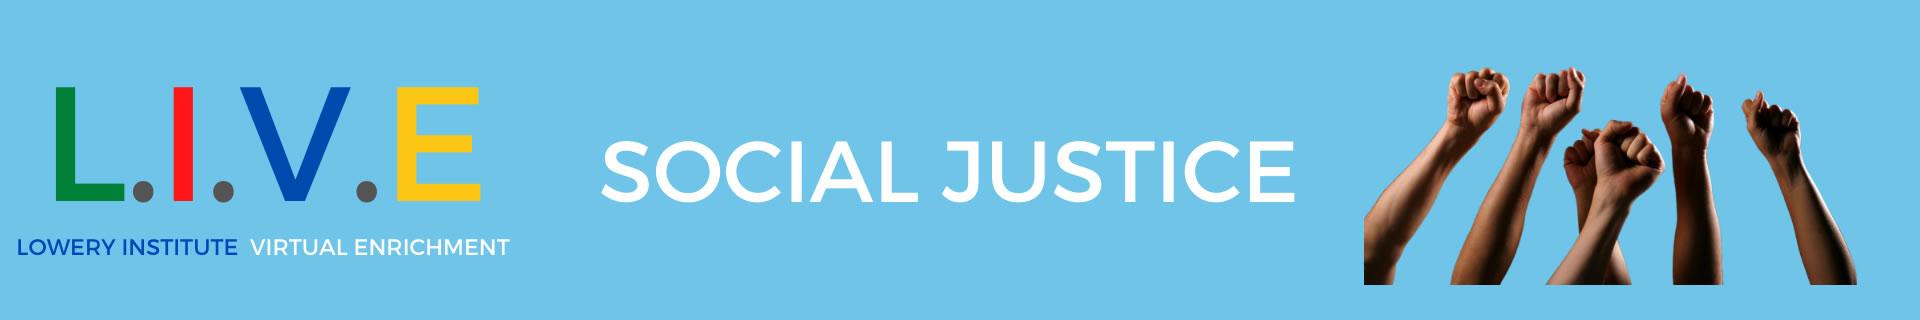 header_justice